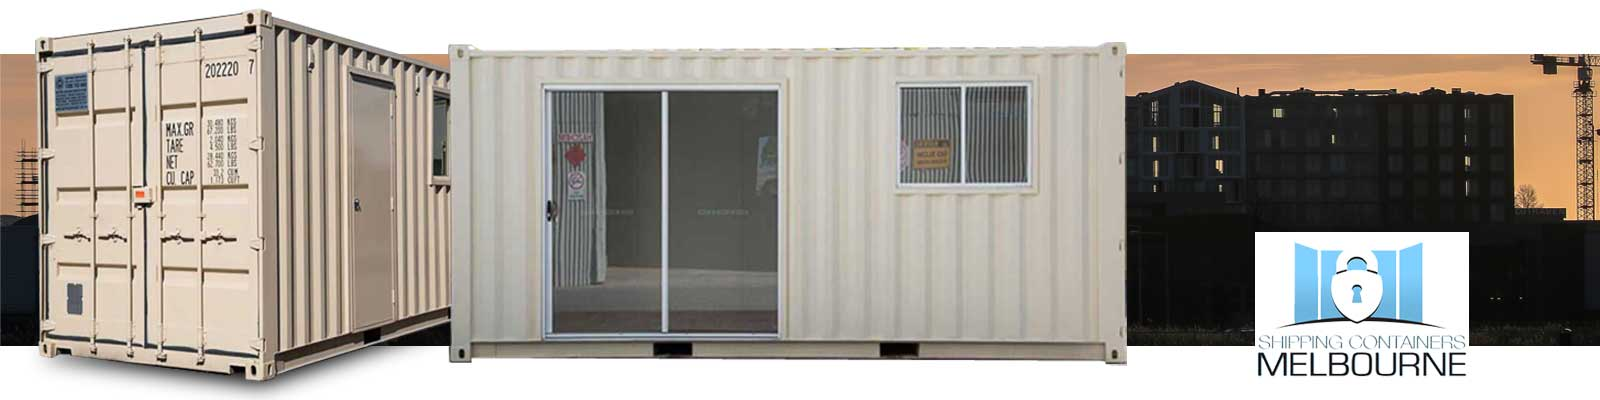 shipping_container_melbourne_logo